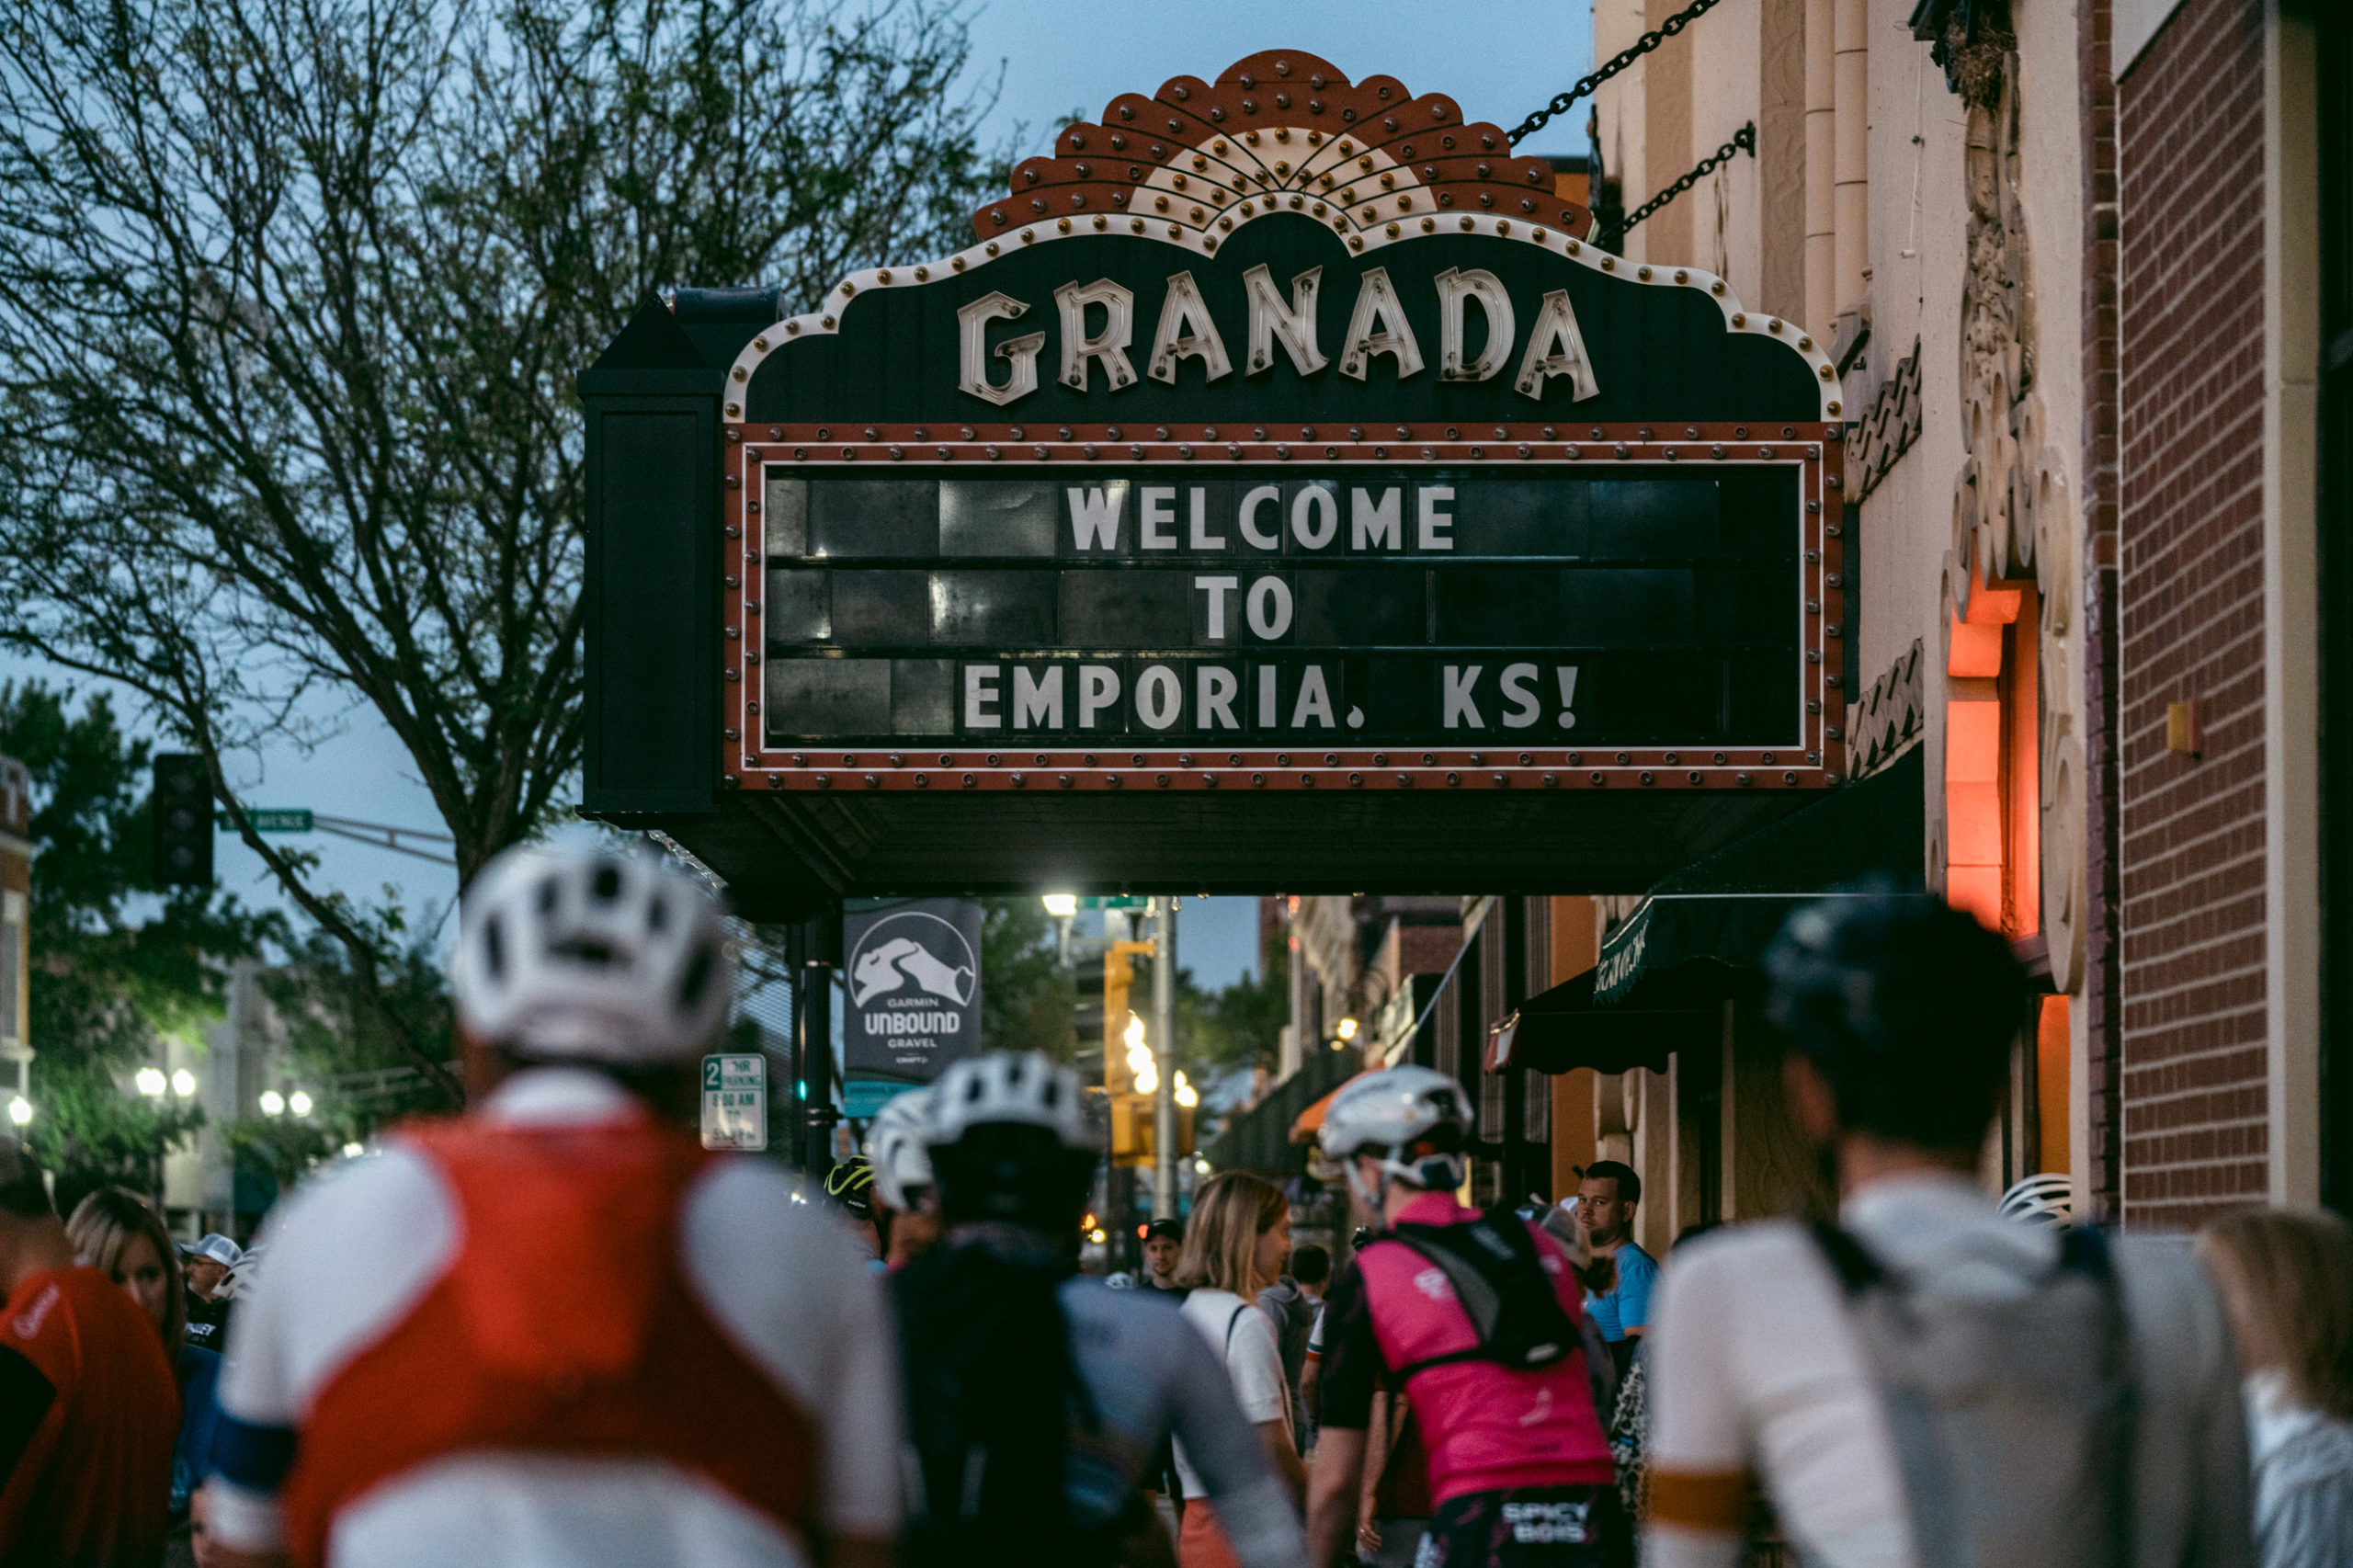 Welcome to Emporia, KS! Photo courtesy ENVE Composites/Ian Matteson